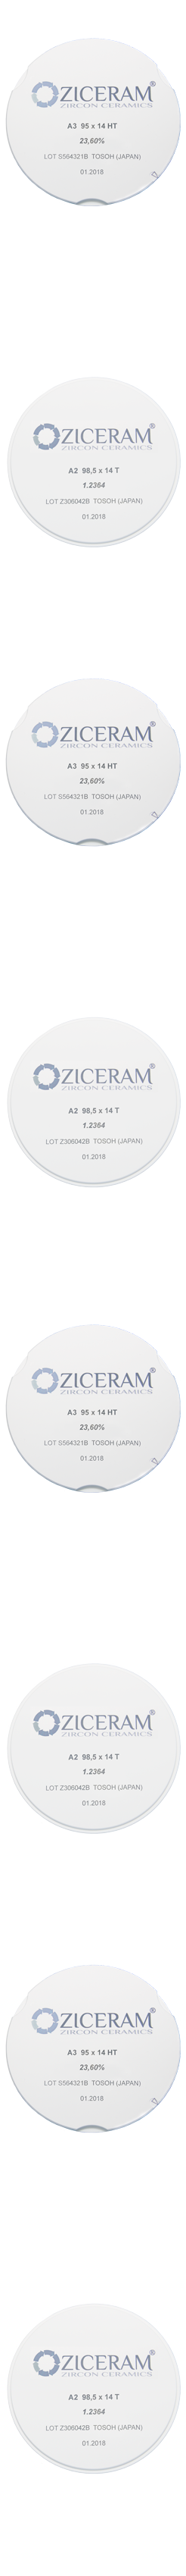 Диски диоксида циркония Ziceram 95мм и 98.5мм